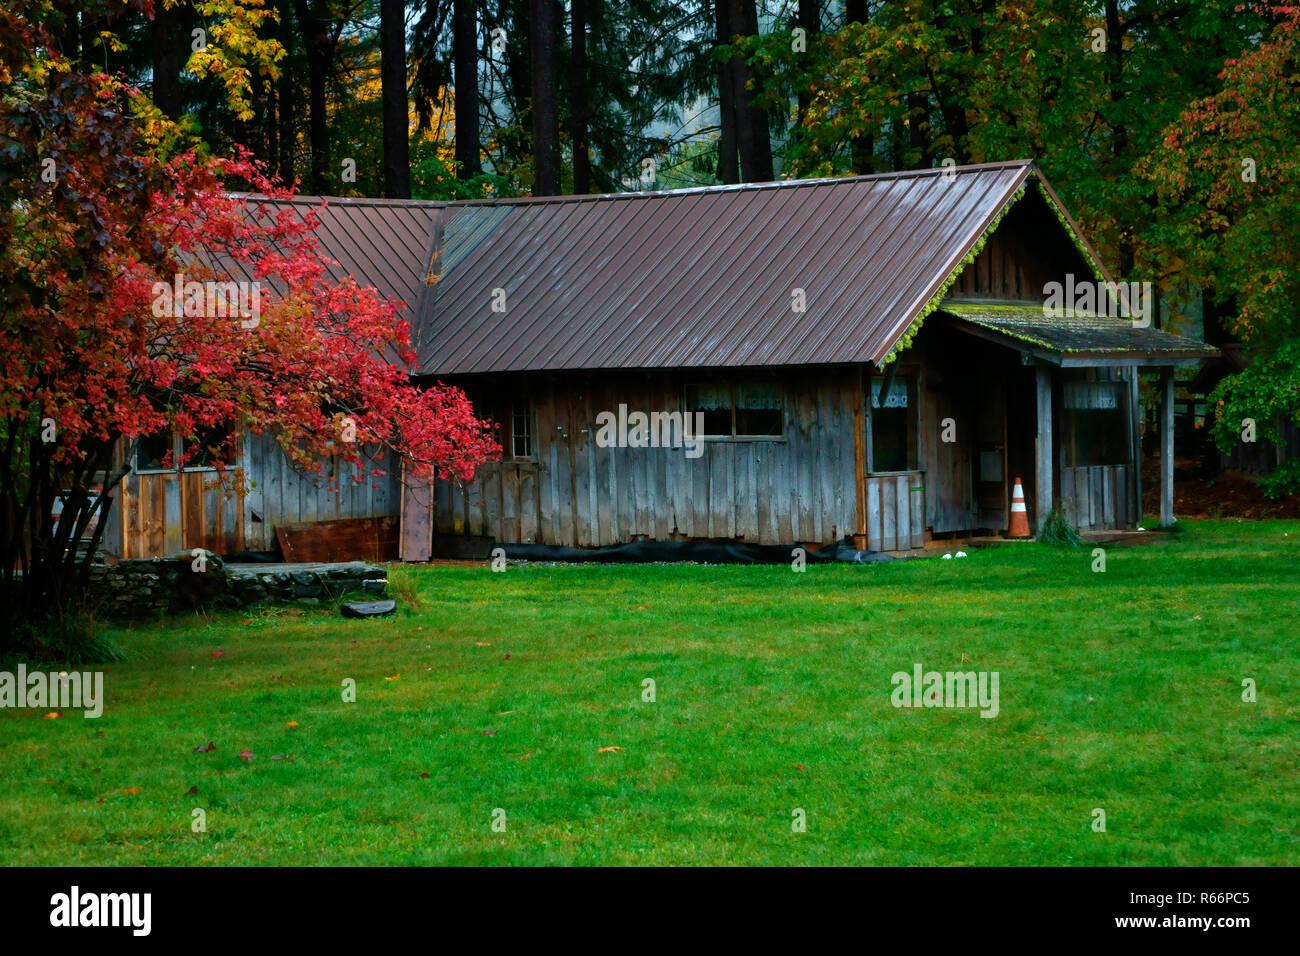 An old cabin being restored in Stehekin's Buckner Orchard. - Stock Image